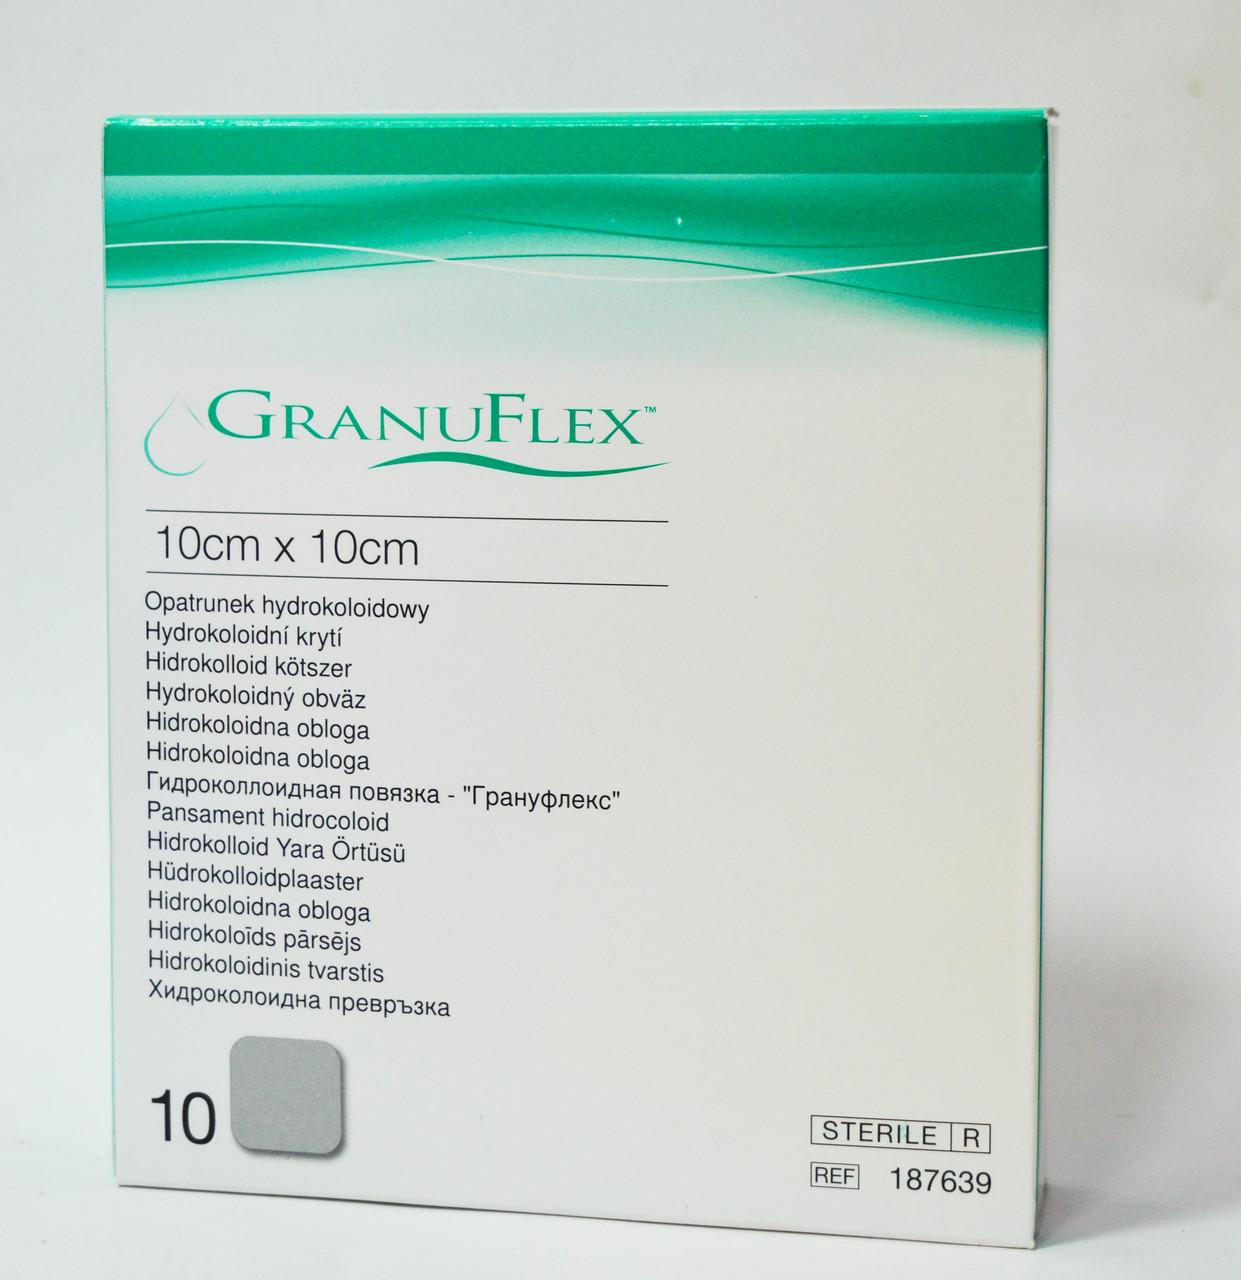 Granuflex (Грануфлекс) 10х10см - Повязка гидроколлоидная